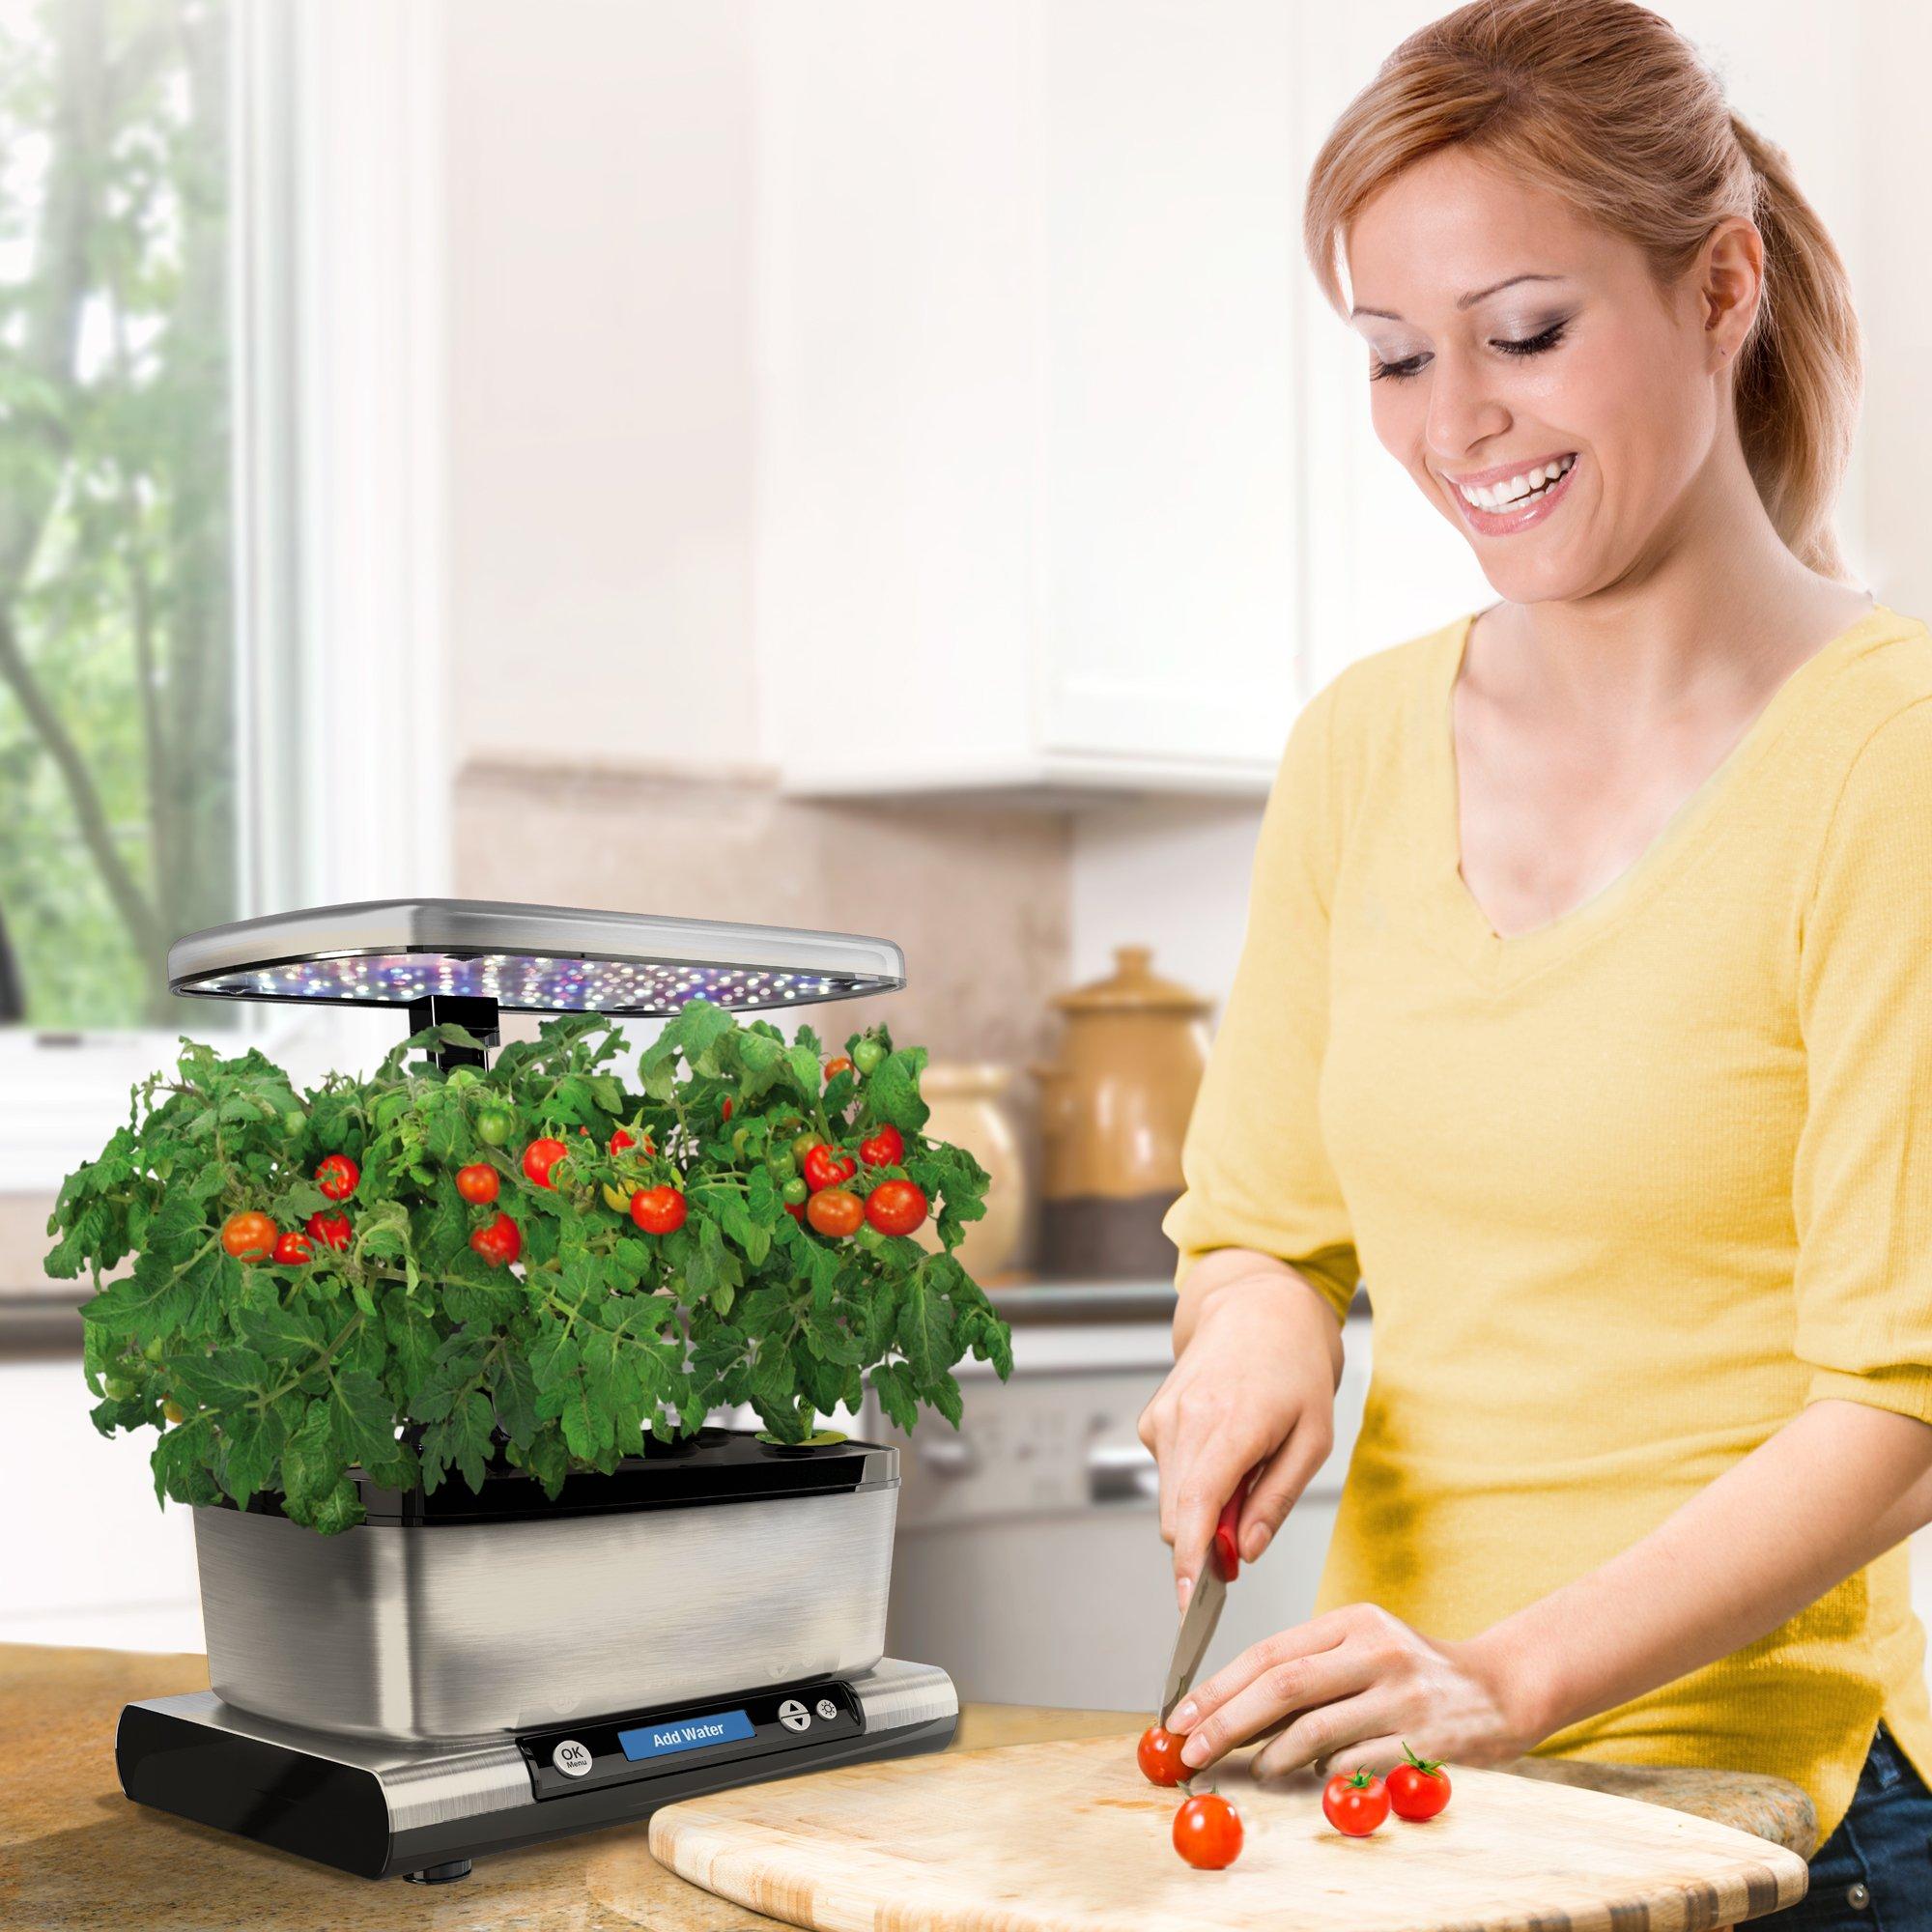 AeroGarden Harvest Elite with Gourmet Herb Seed Pod Kit, Stainless Steel by AeroGrow (Image #1)